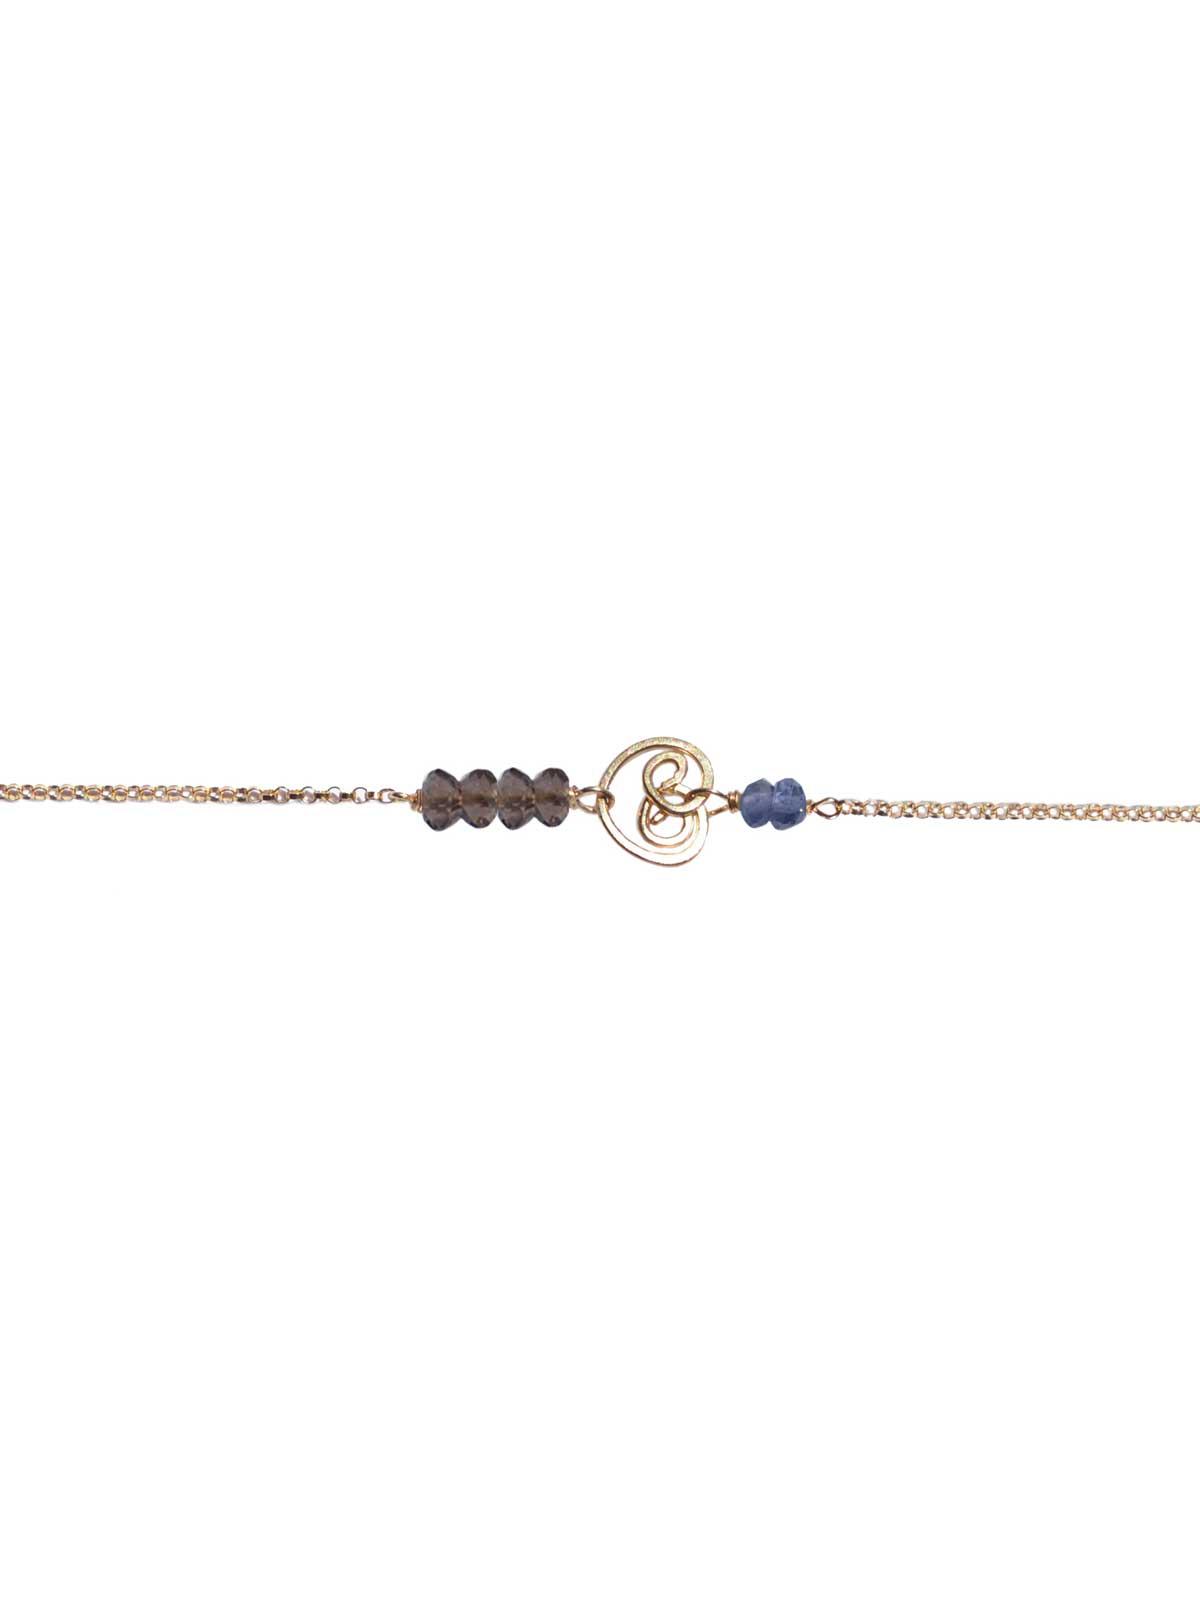 Bracelet in 14K Gold-filled chain faceted Smoky Quartz Iolite